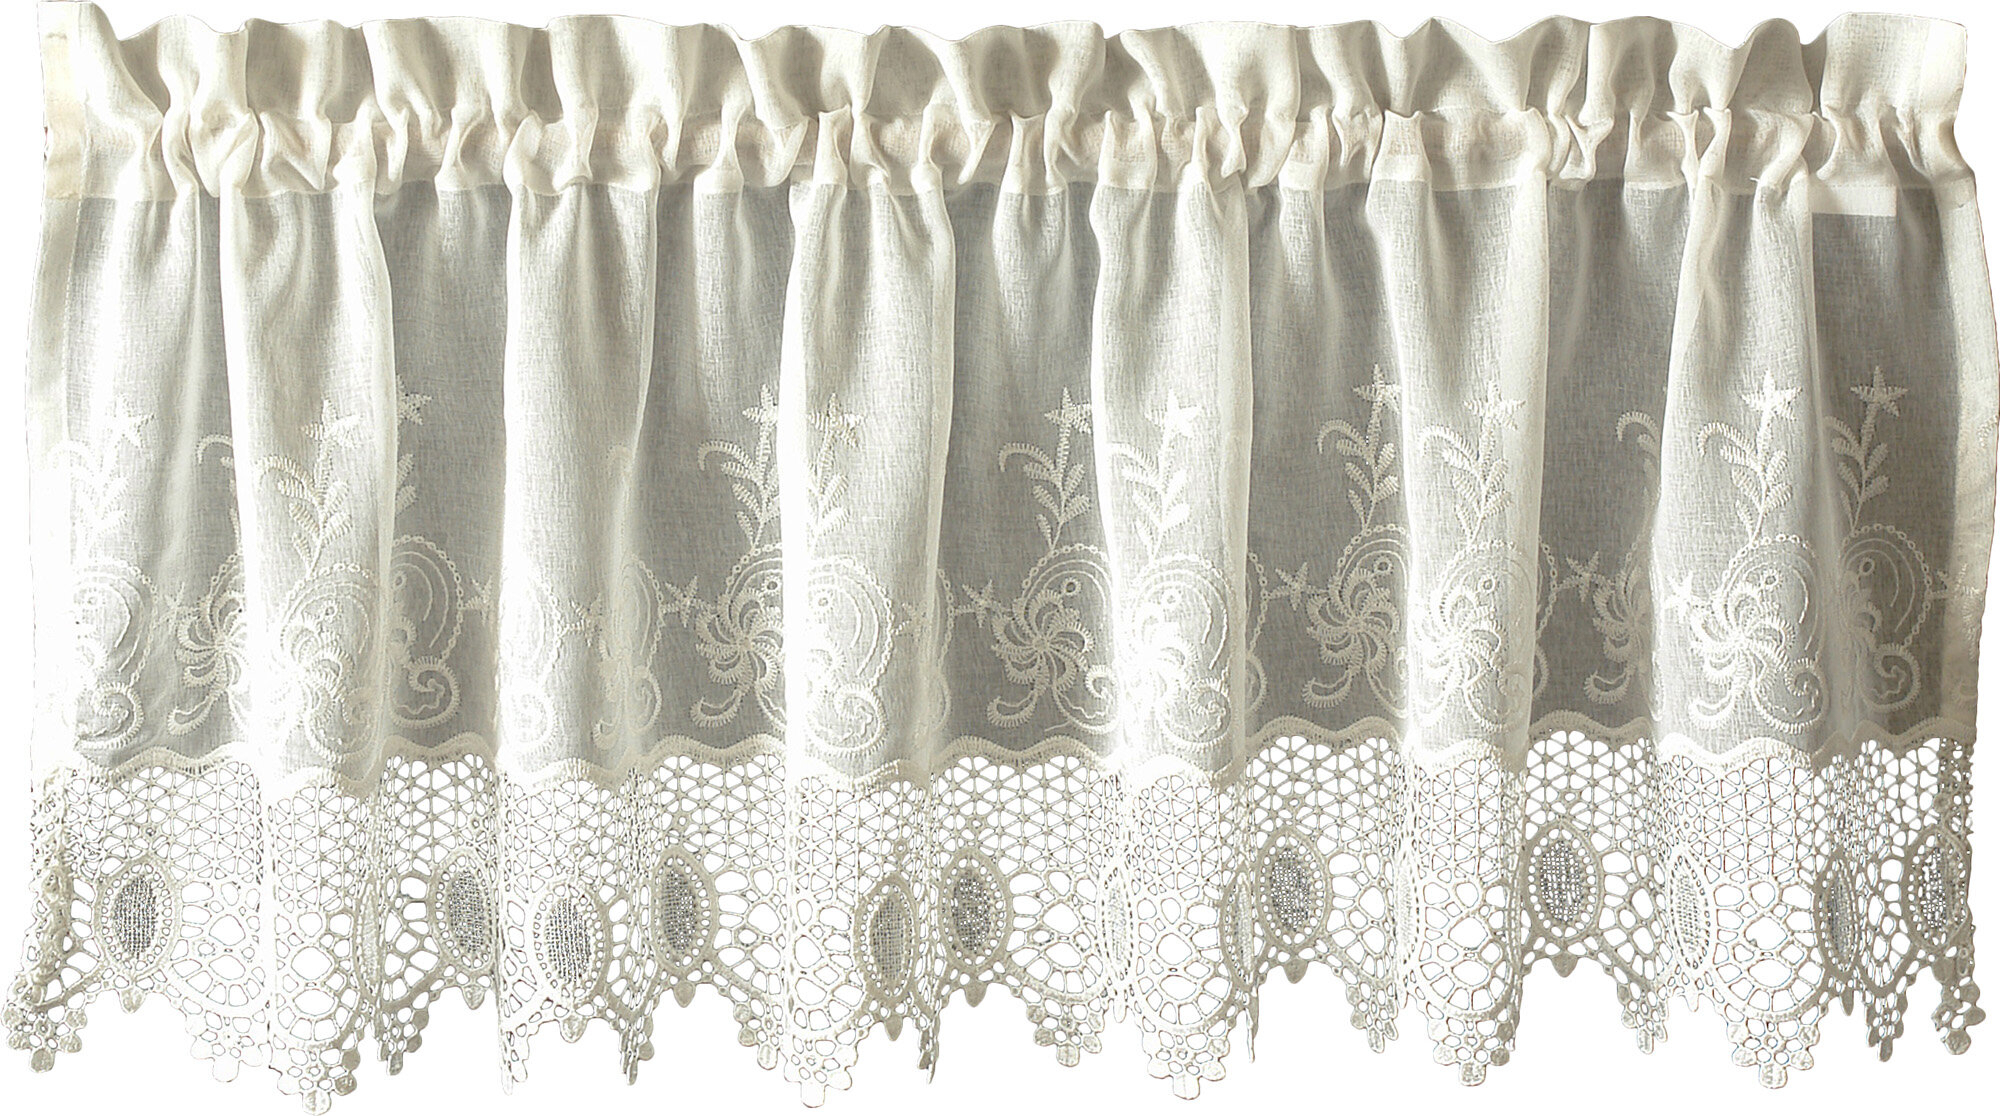 "Oliverson Macramé 55"" Curtain Valance Regarding Class Blue Cotton Blend Macrame Trimmed Decorative Window Curtains (View 19 of 20)"